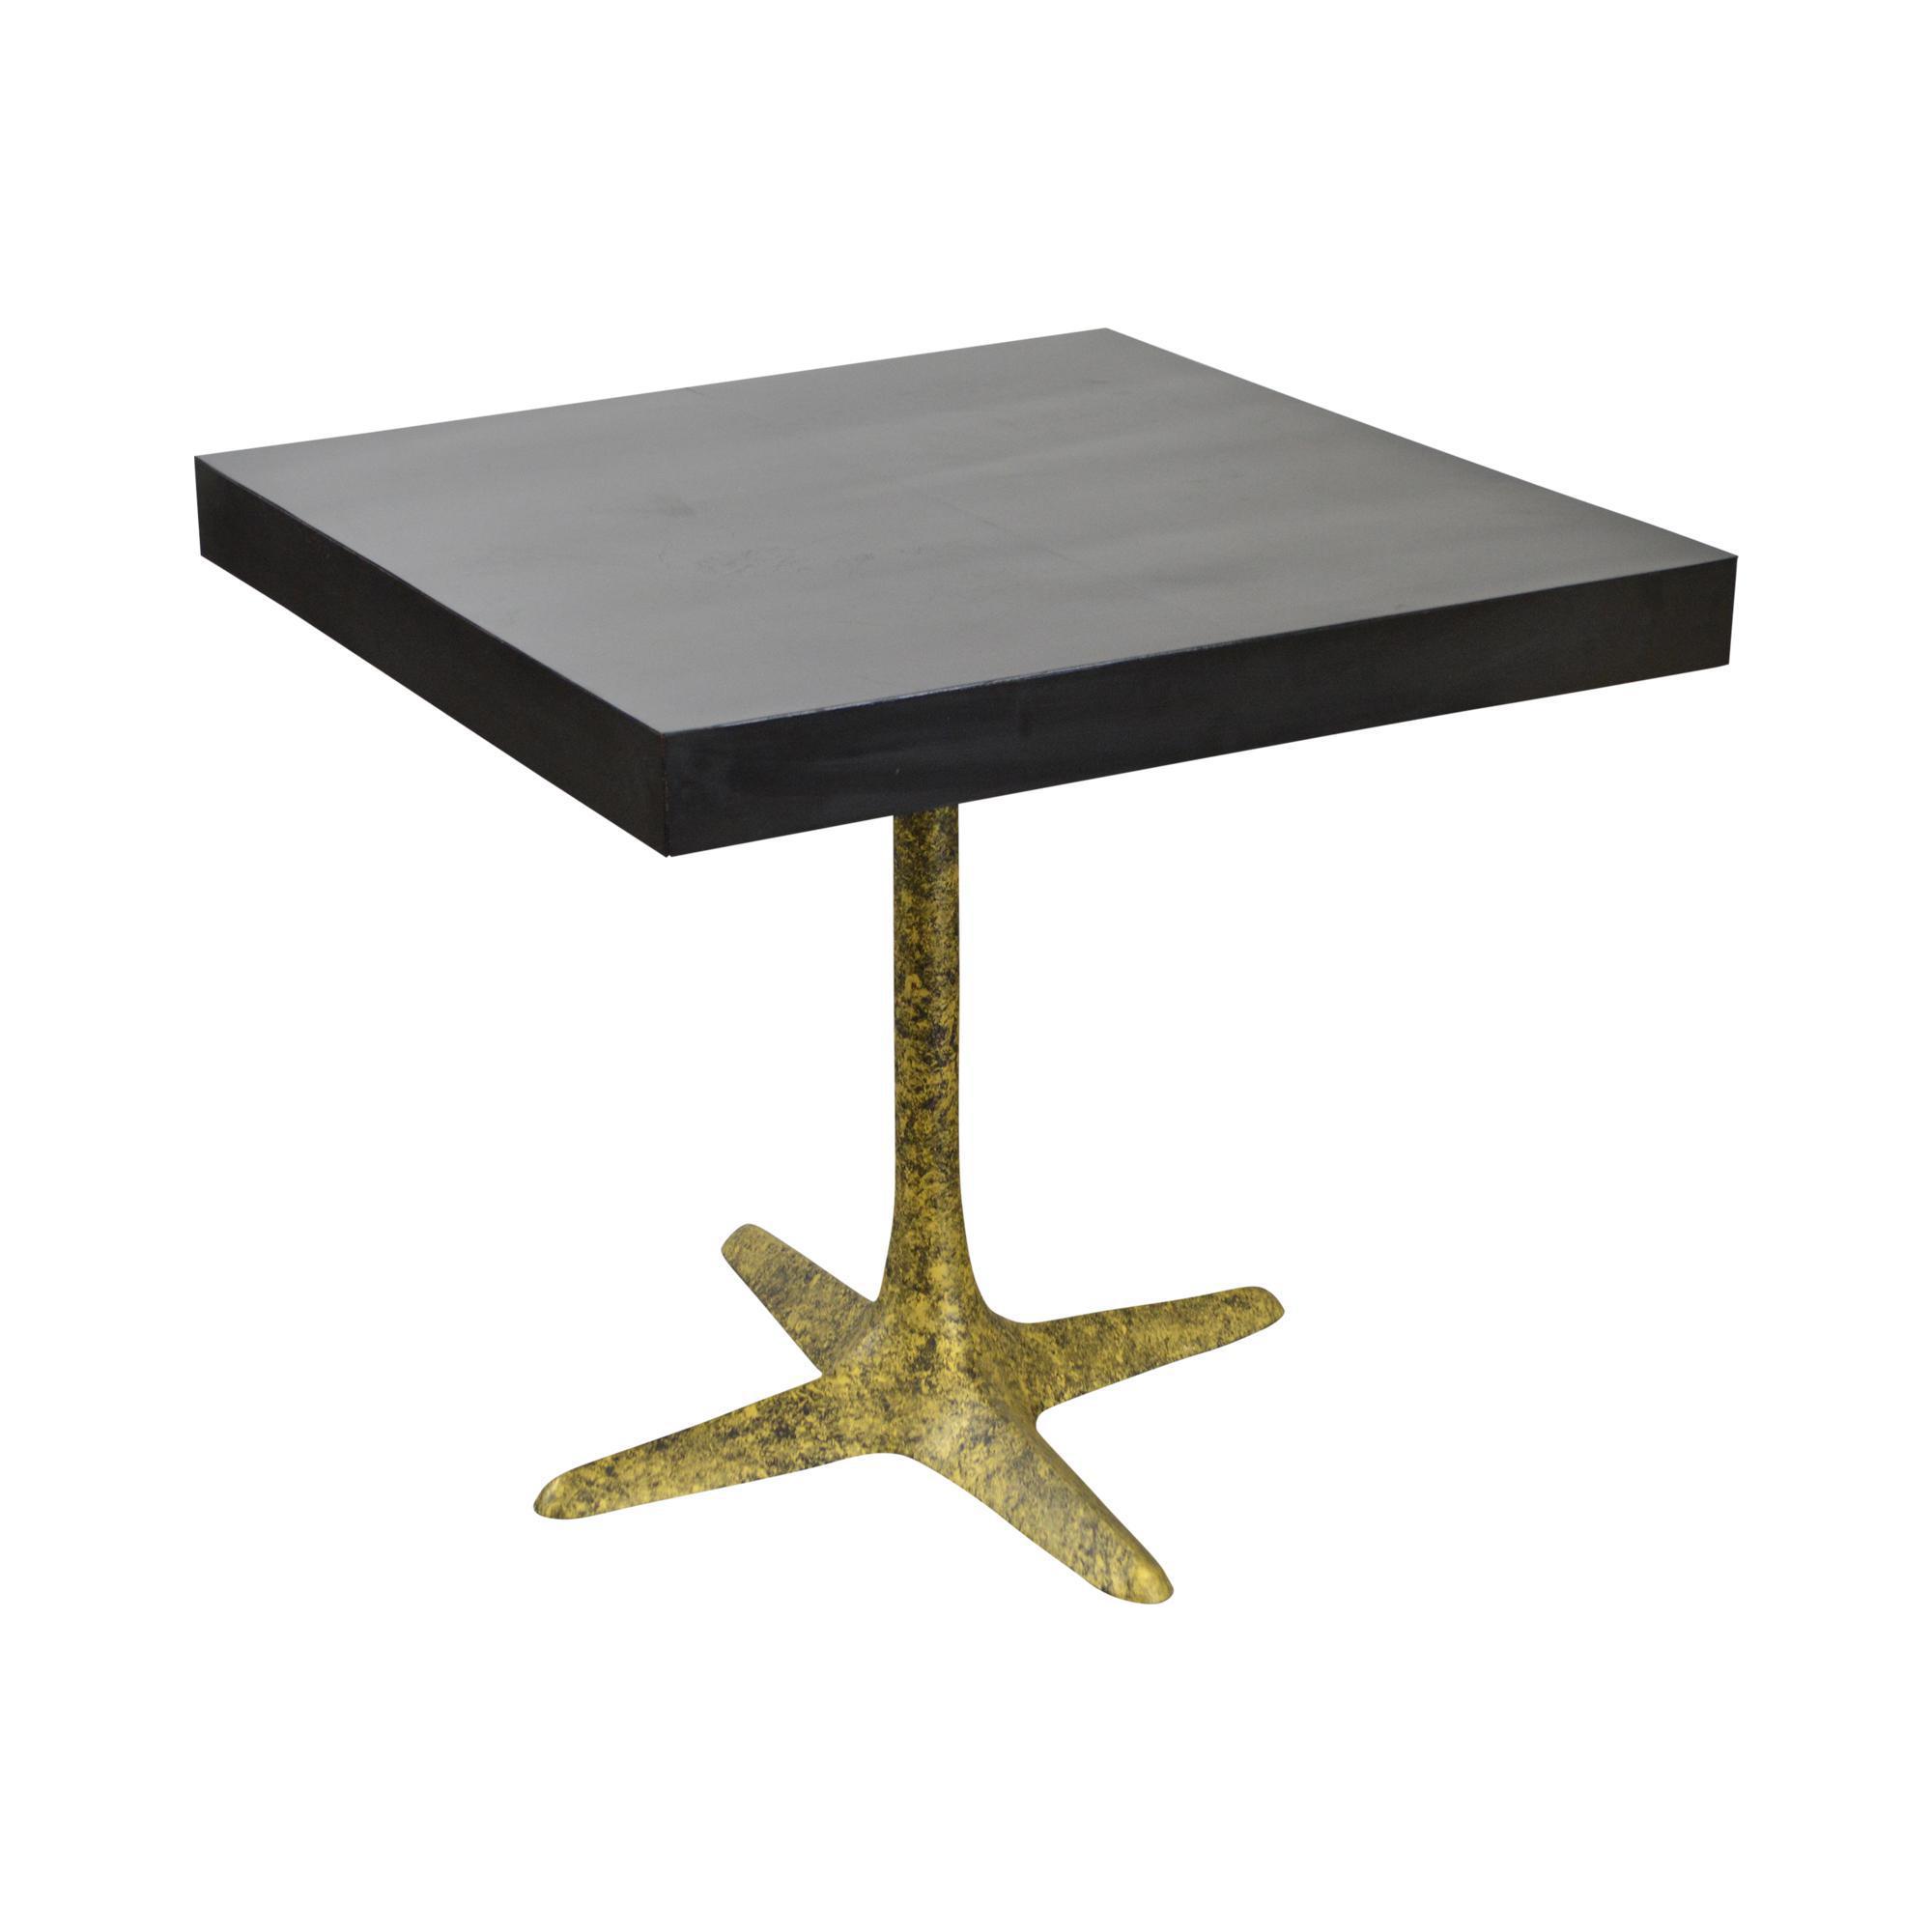 Mid Century Modern Square Top Faux Painted Metal Pedestal Café Table